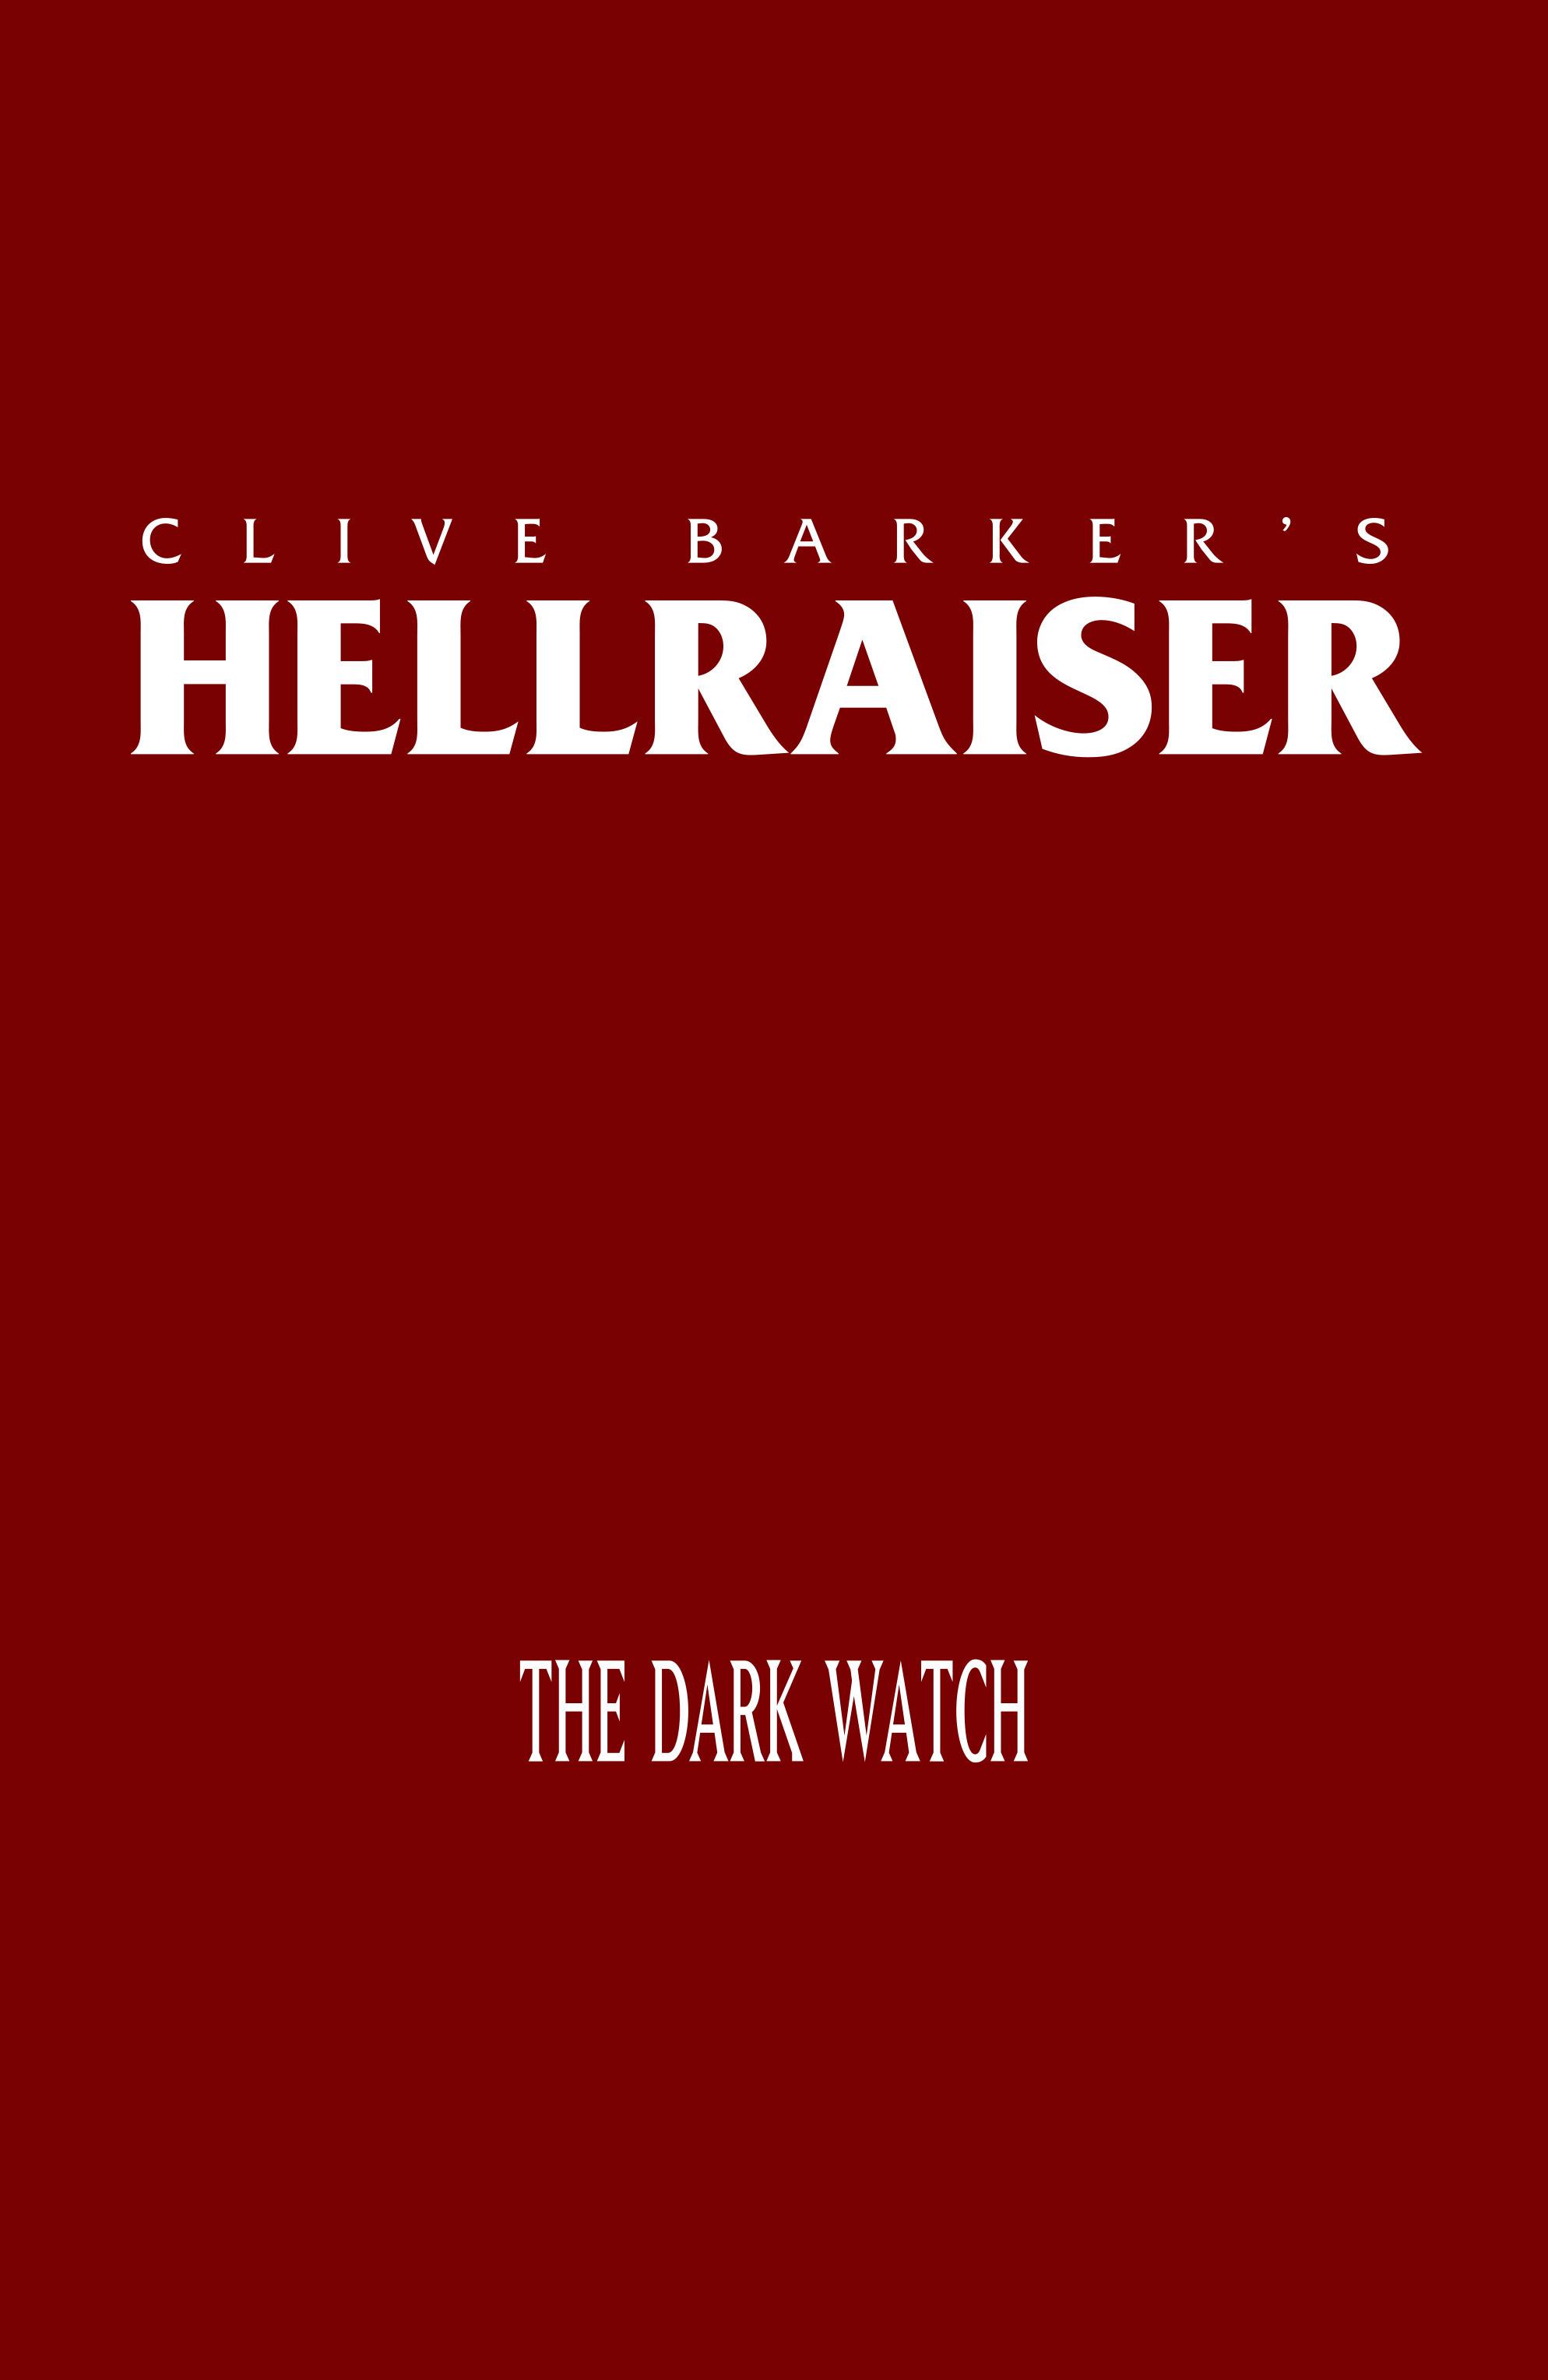 Read online Clive Barker's Hellraiser: The Dark Watch comic -  Issue # TPB 3 - 3